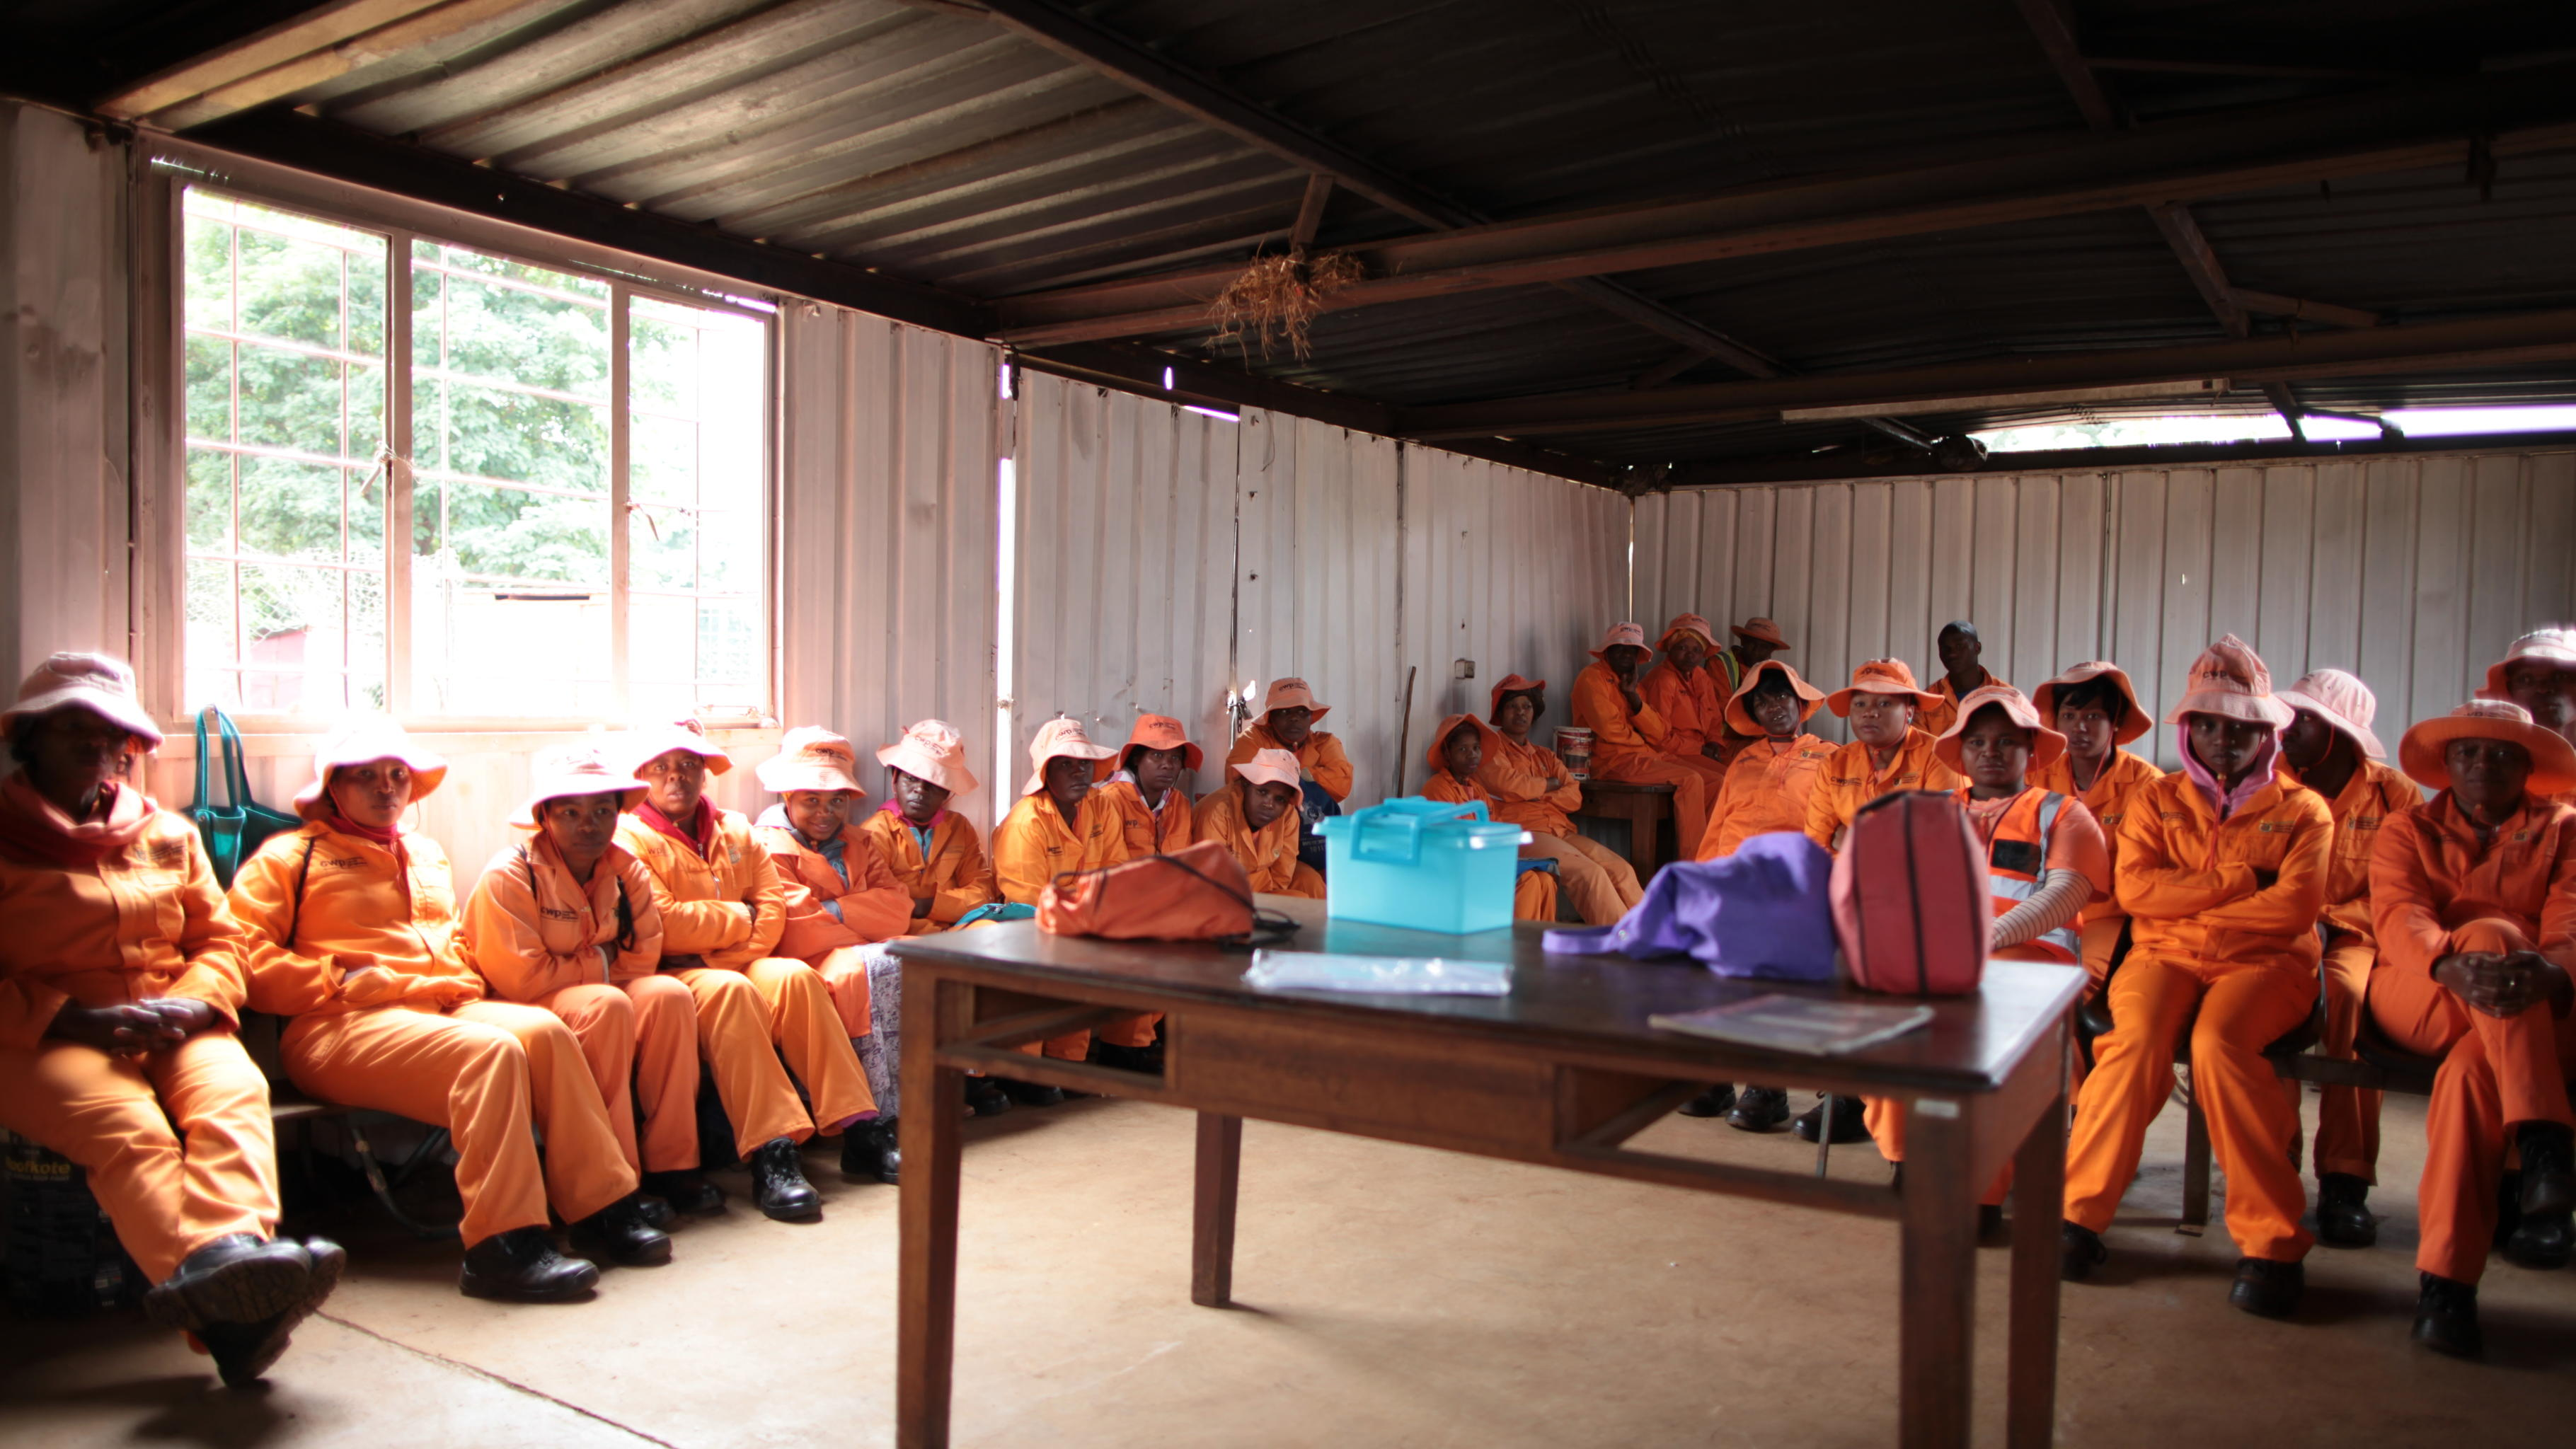 Besprechung ehrenamtlicher Helfer/innen in Soweto. @ Carla Meurer